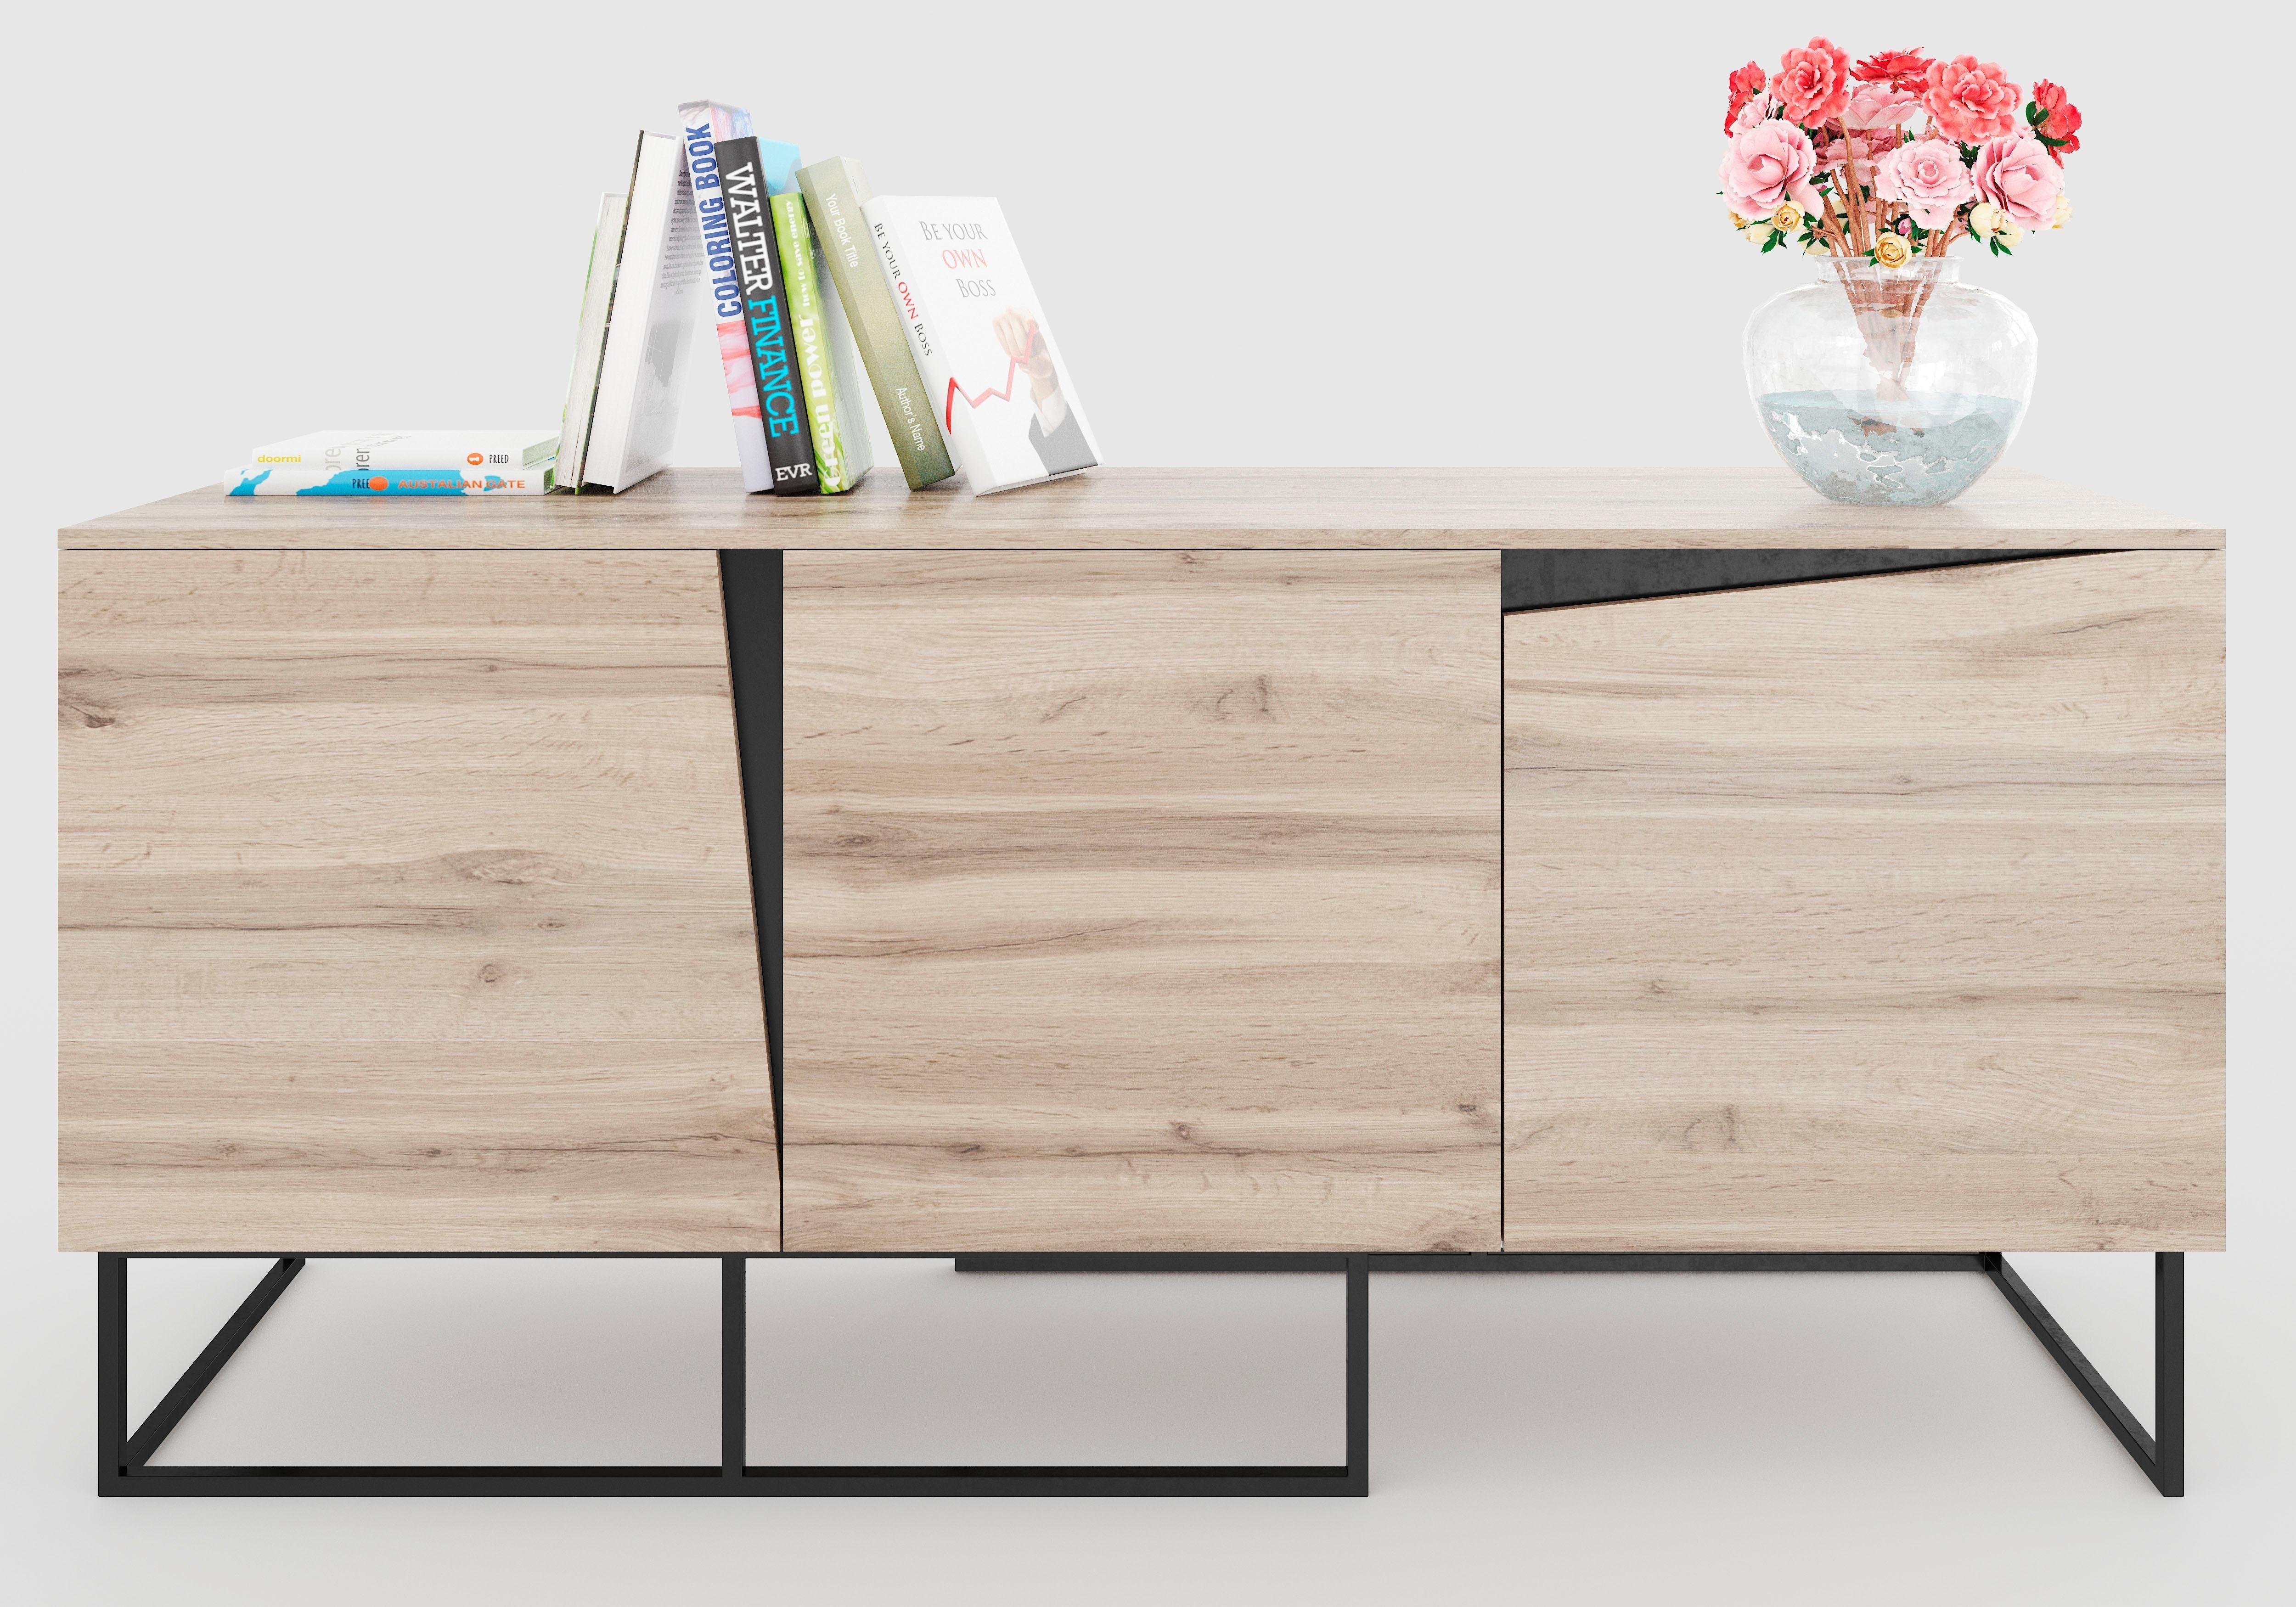 Home affaire Sideboard Carv Breite 165 cm